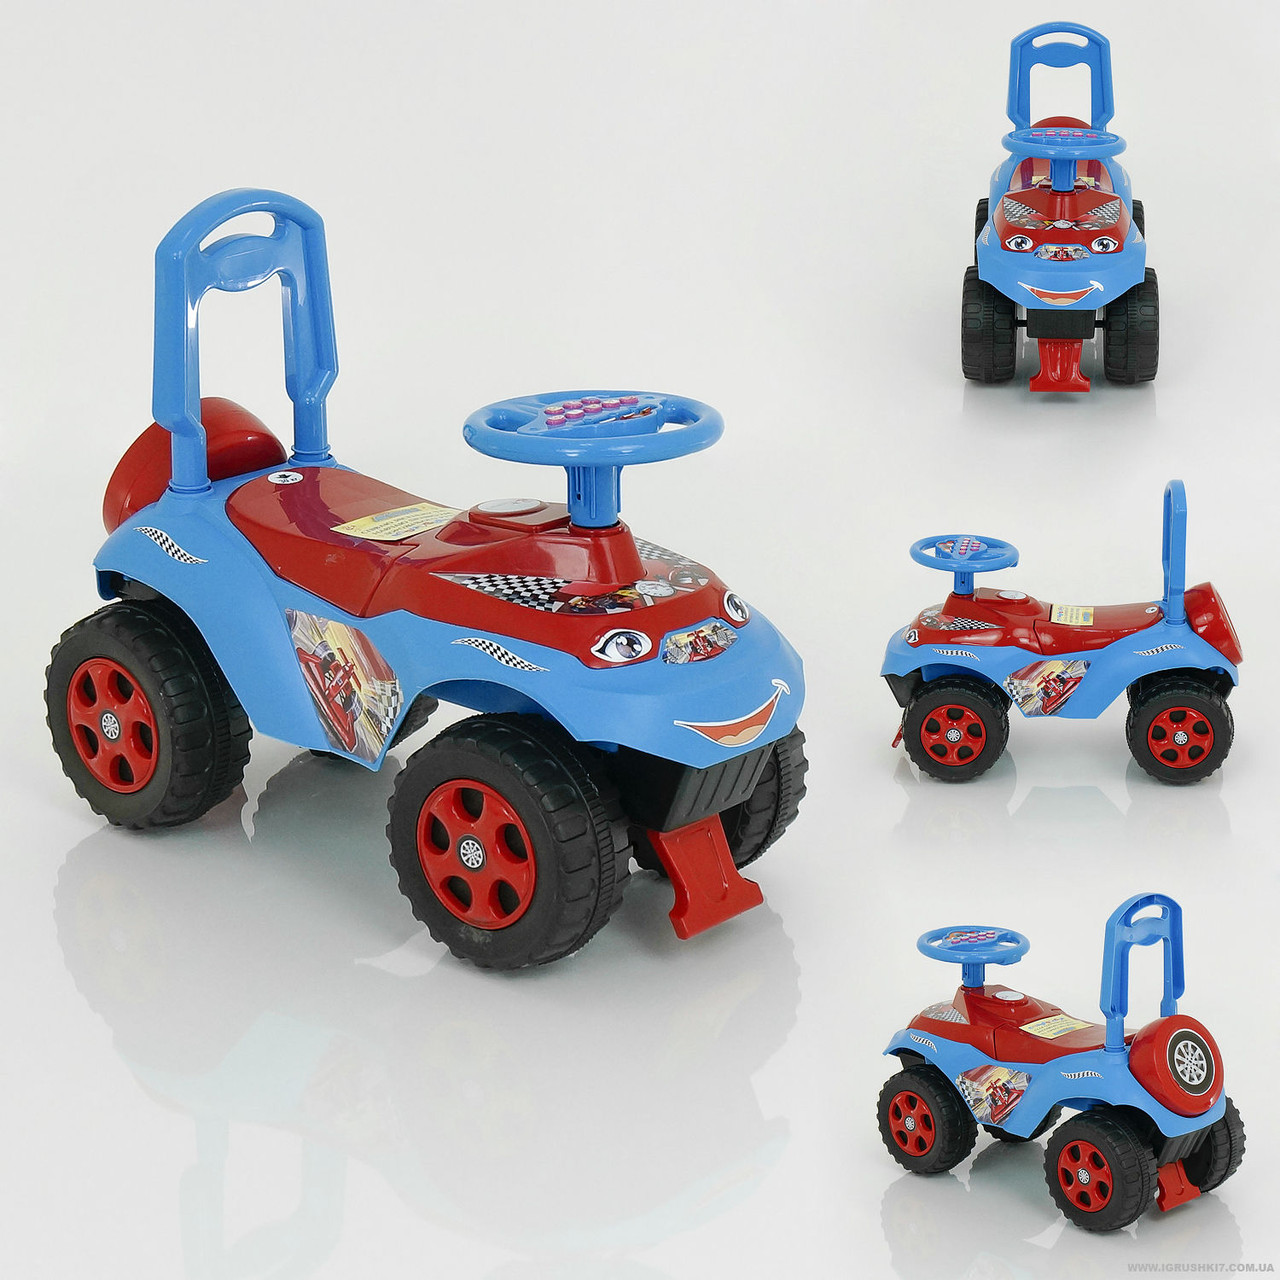 Каталка-толокар Автошка 013117/R/12 цвет красно-синий